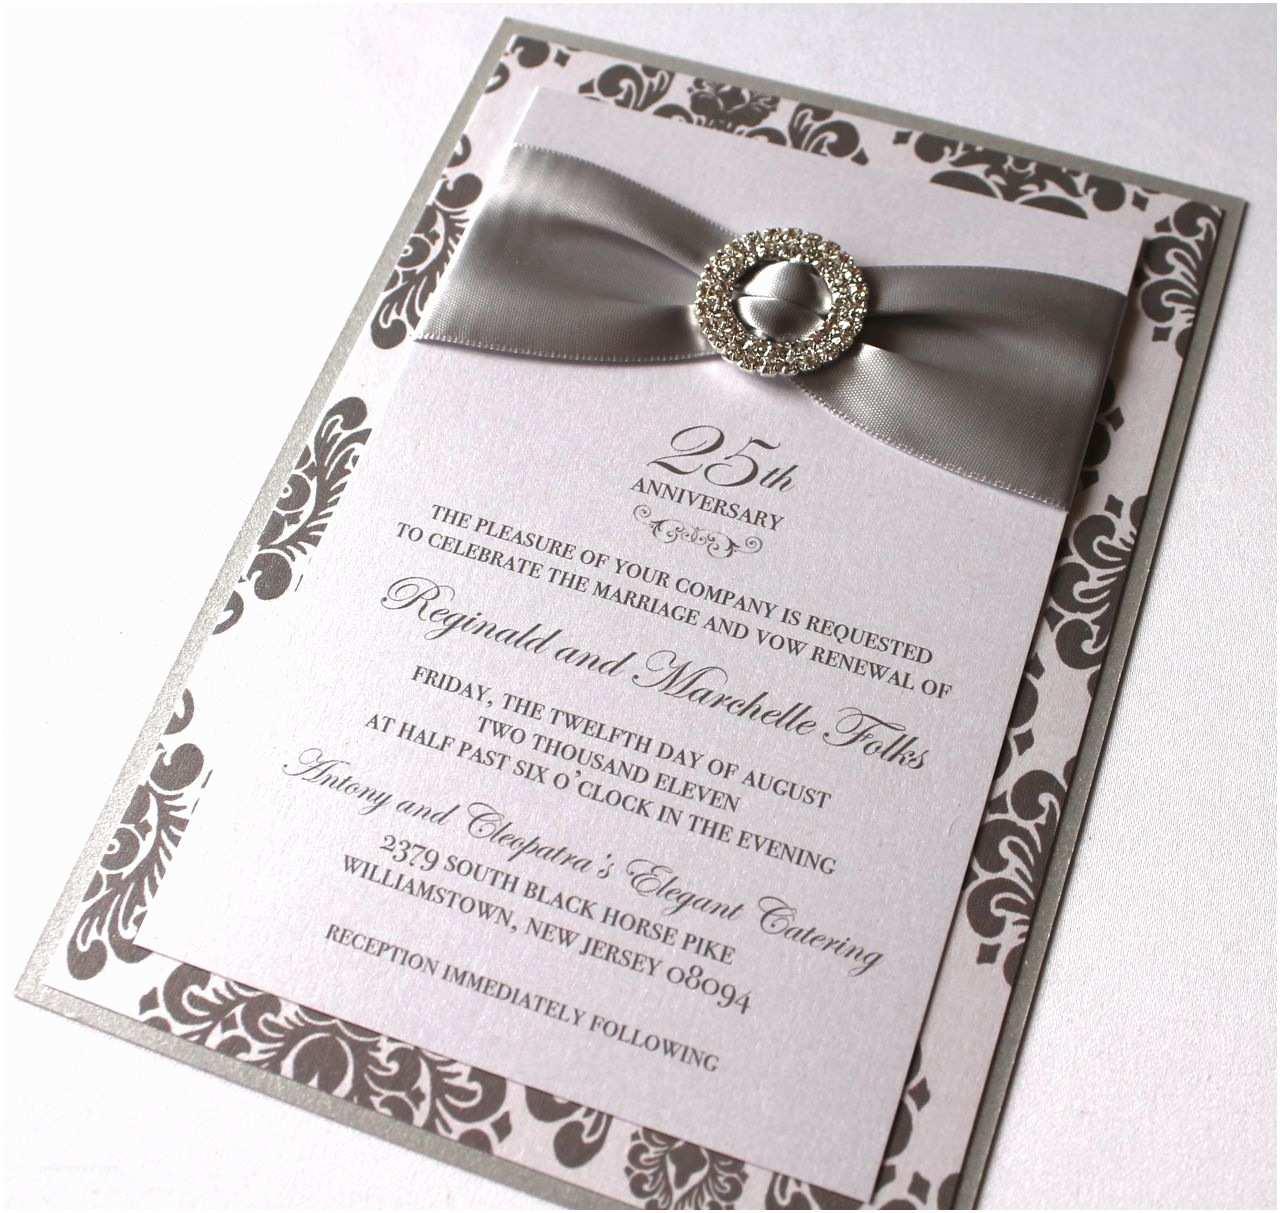 25th Wedding Anniversary Invitations 25th Anniversary Invitations Silver and White Damask